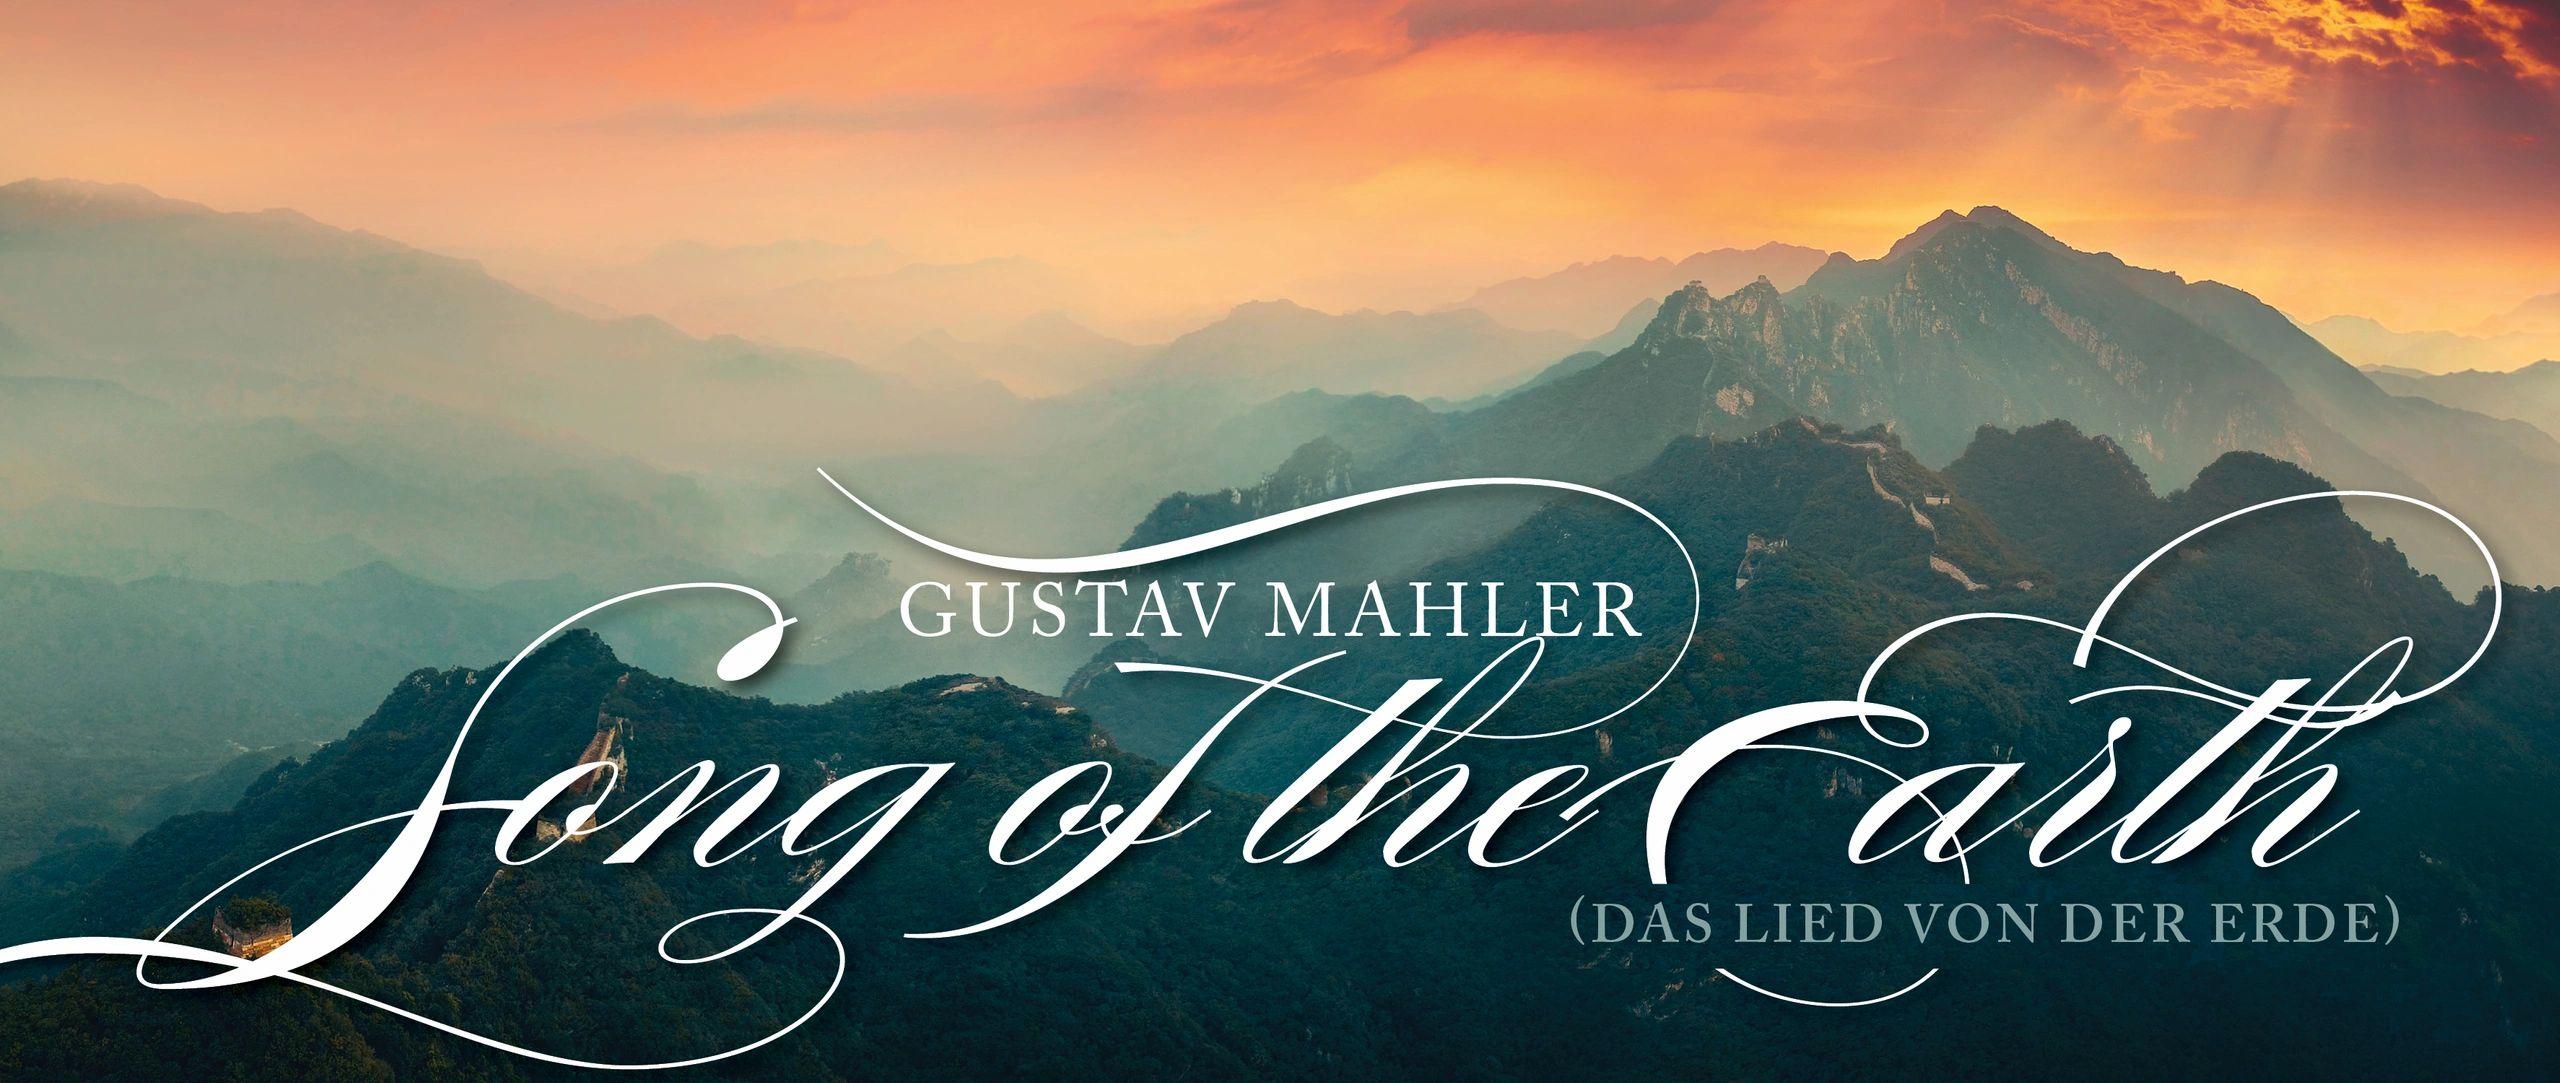 IN REVIEW: Gustav Mahler - DAS LIED VON DER ERDE (Opera Roanoke, 13 December 2020; Graphic © by Opera Roanoke)